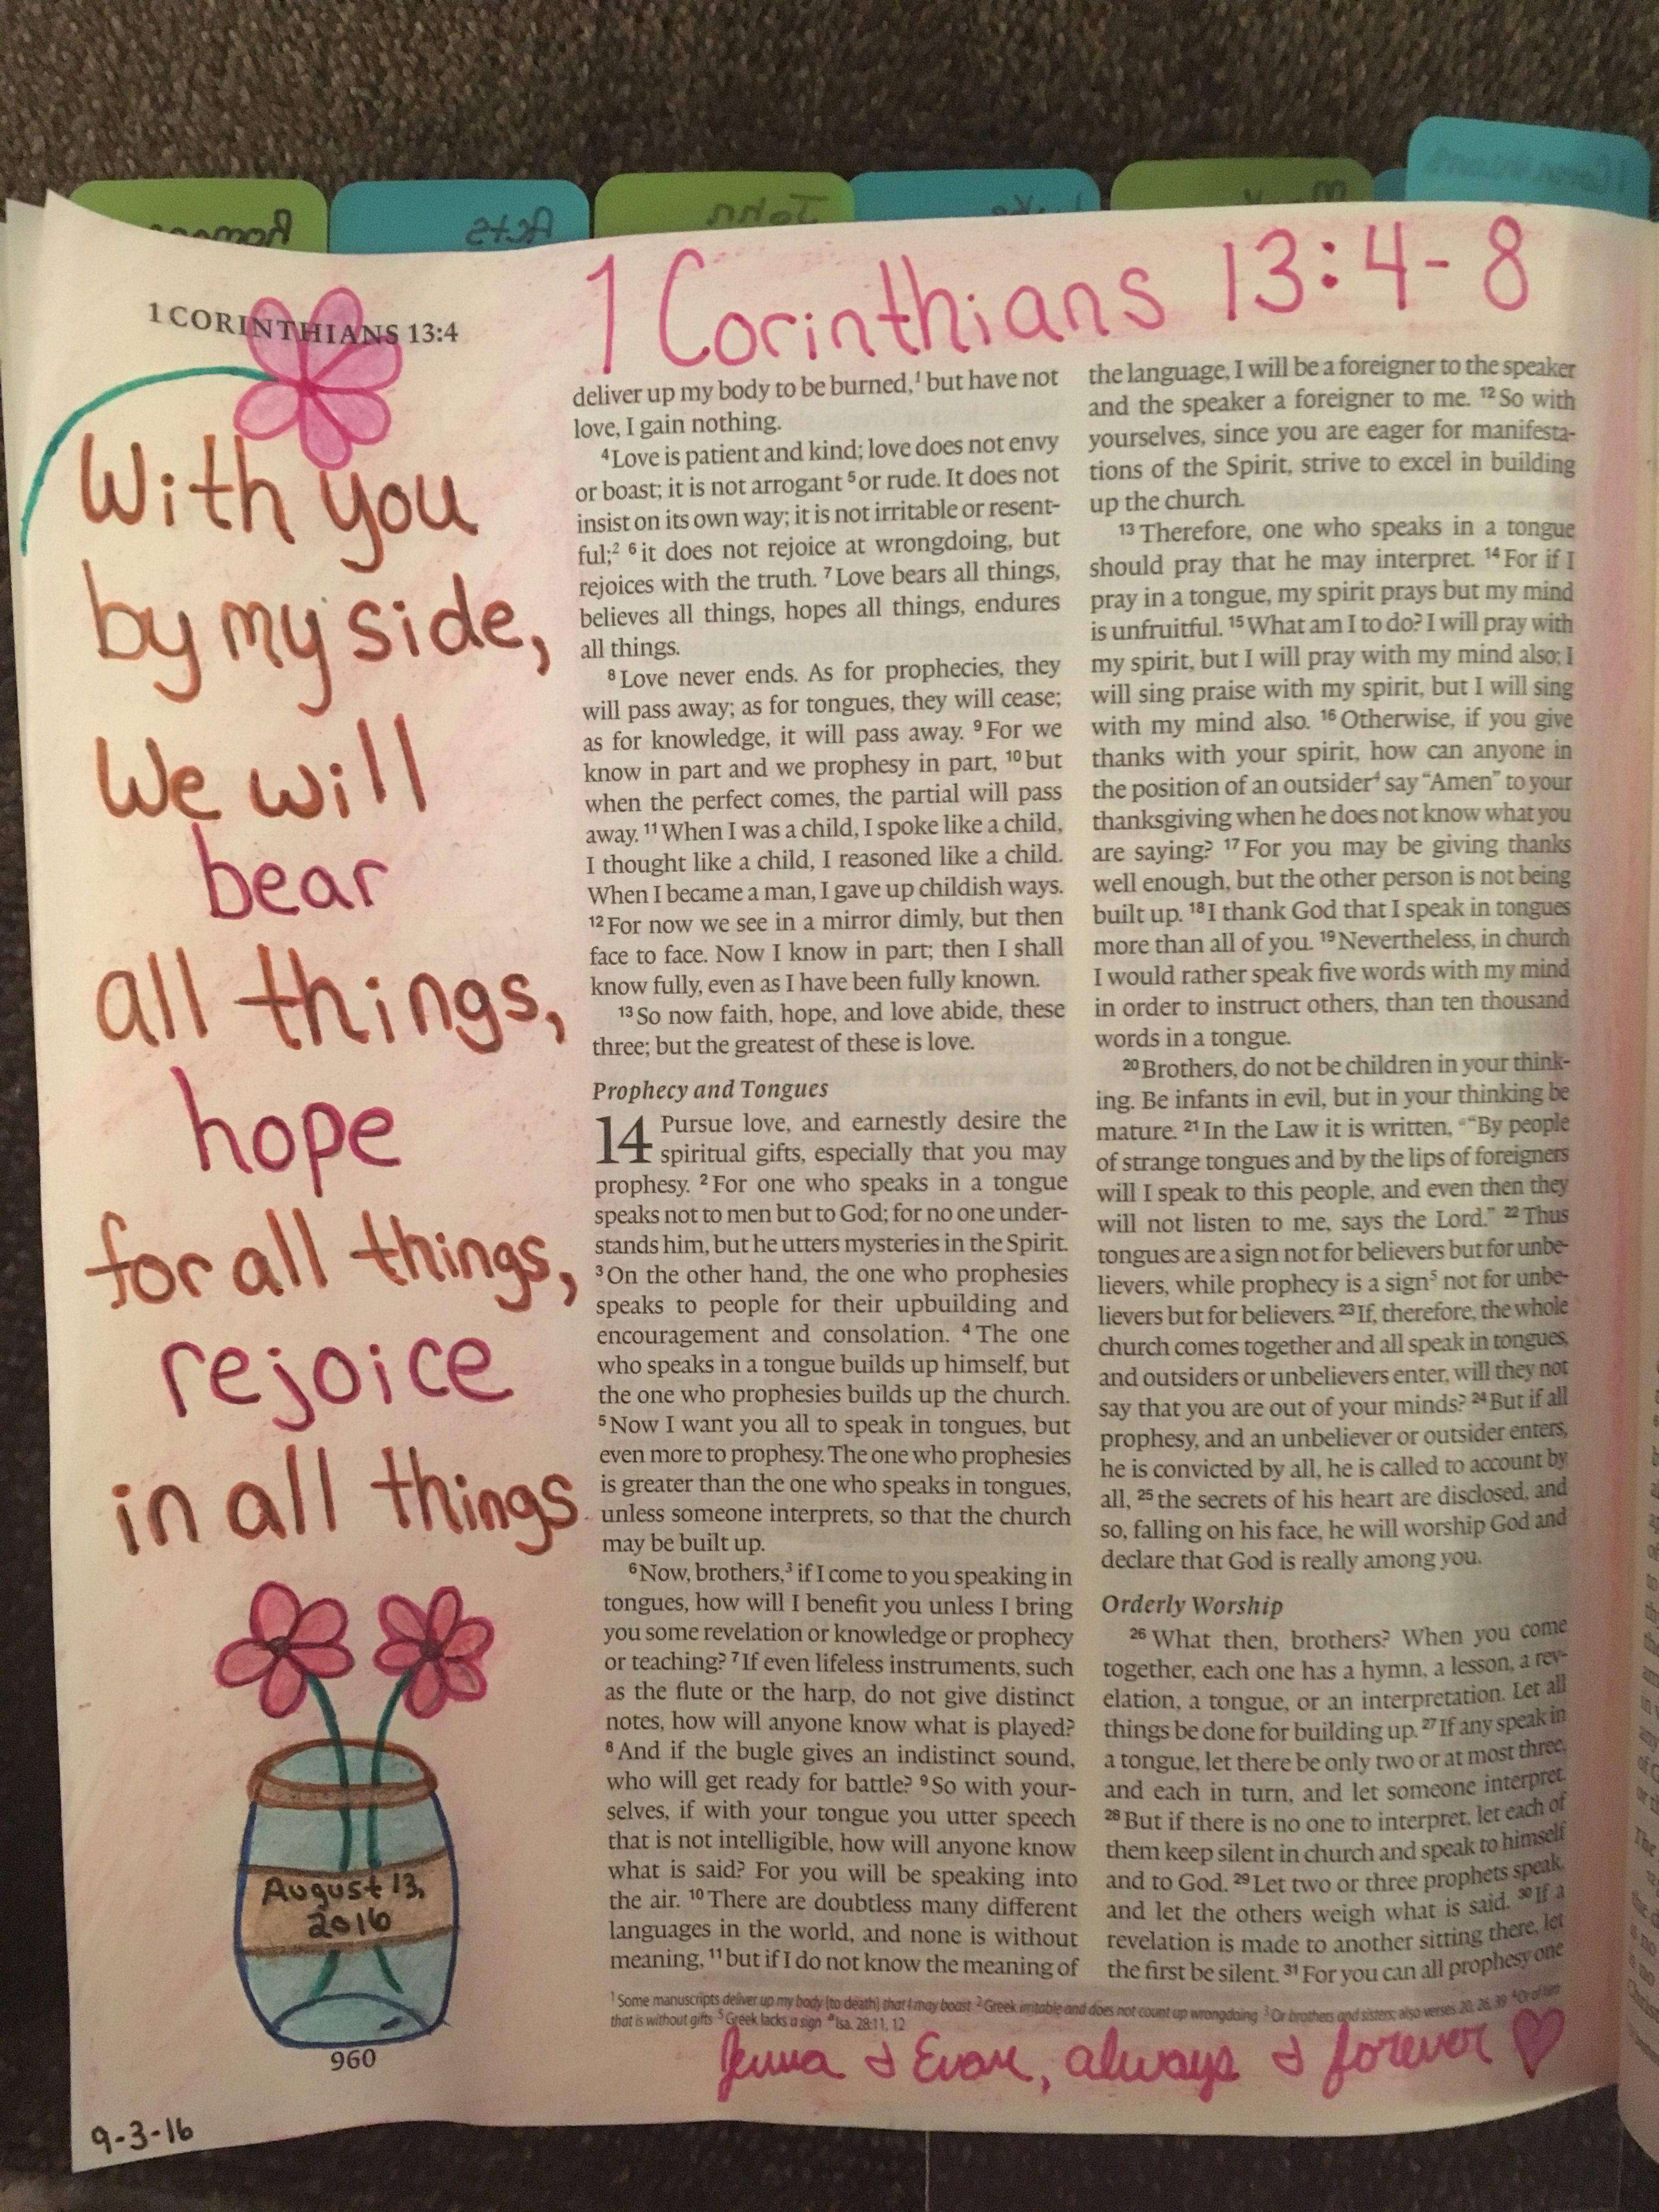 25+ Wedding readings 1 corinthians 13 4 8a info